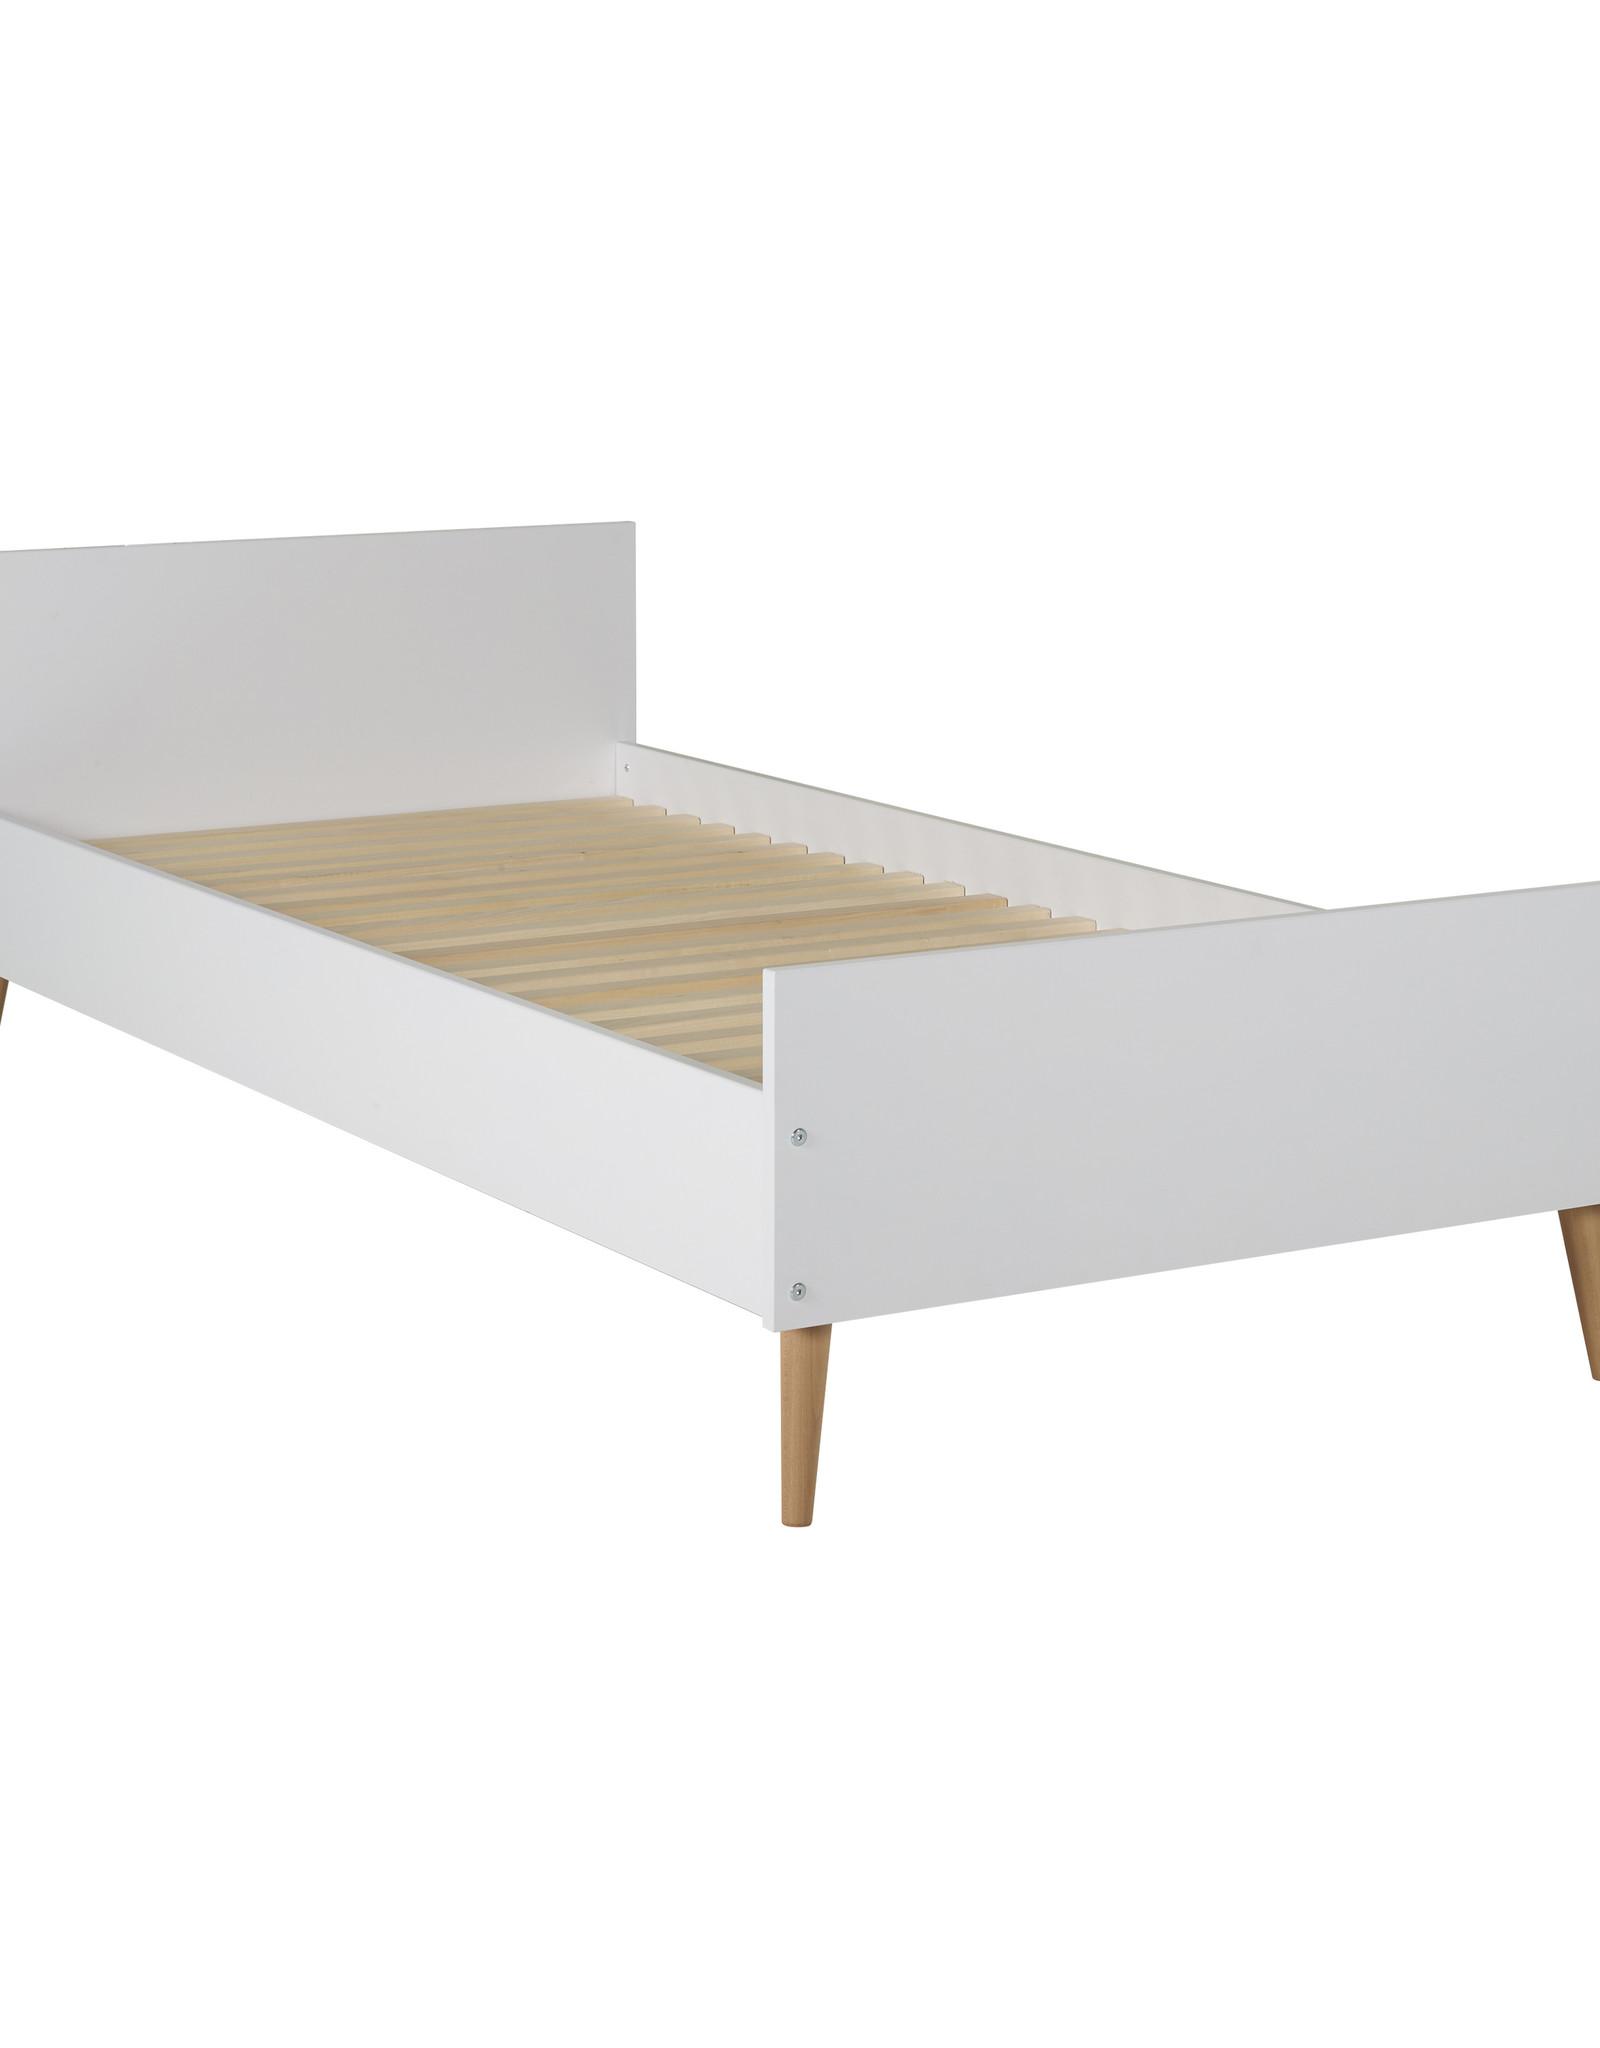 Cocoon Junior Bed 200*90 Cm - Ice White